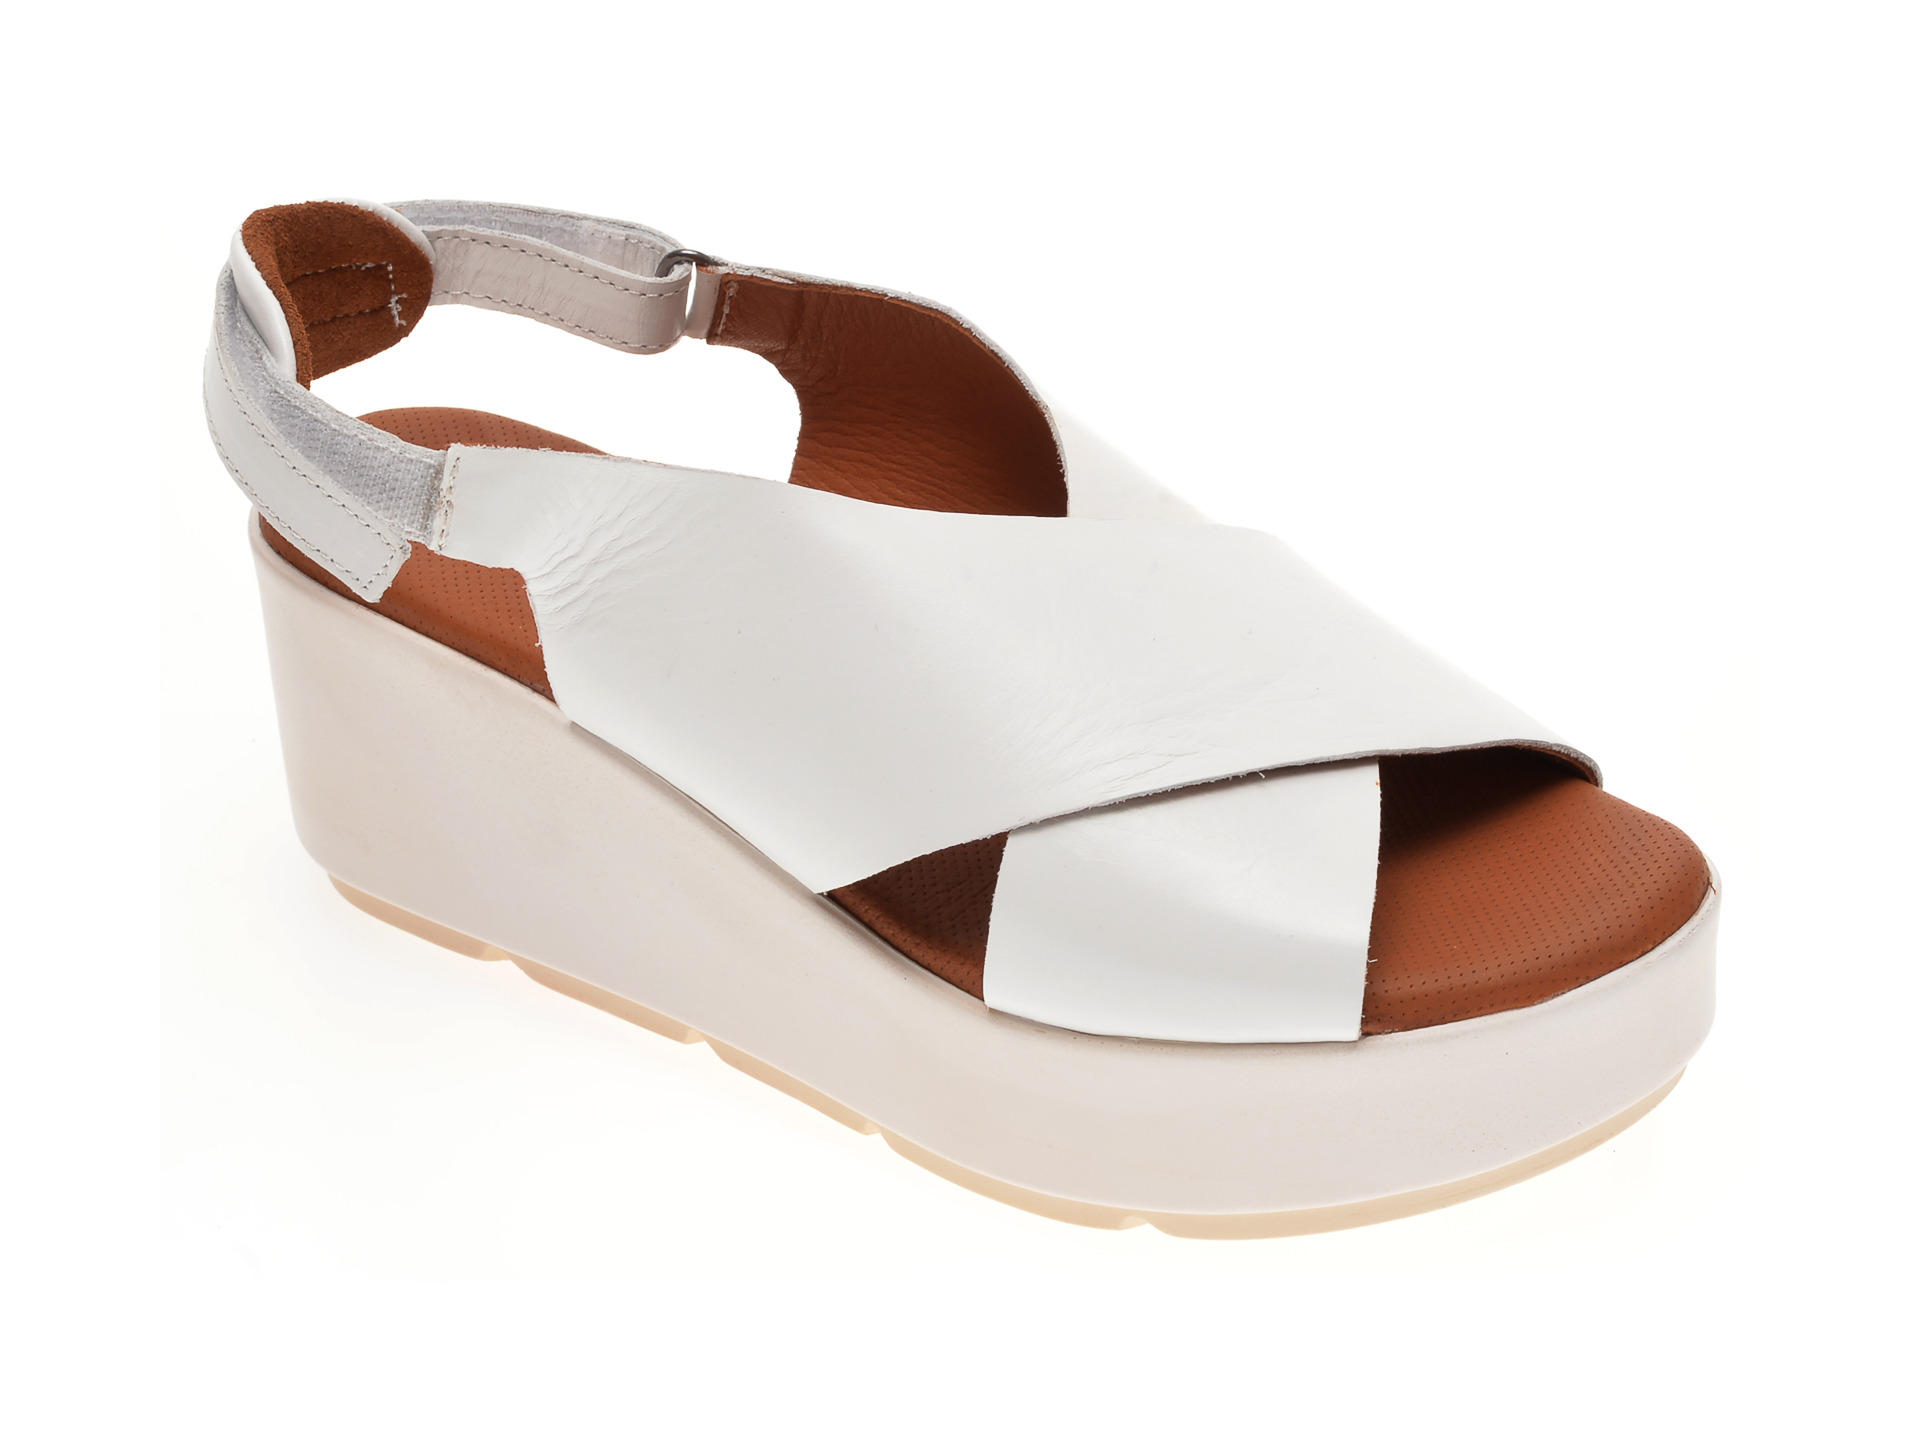 Sandale BABOOS albe, 2520, din piele naturala